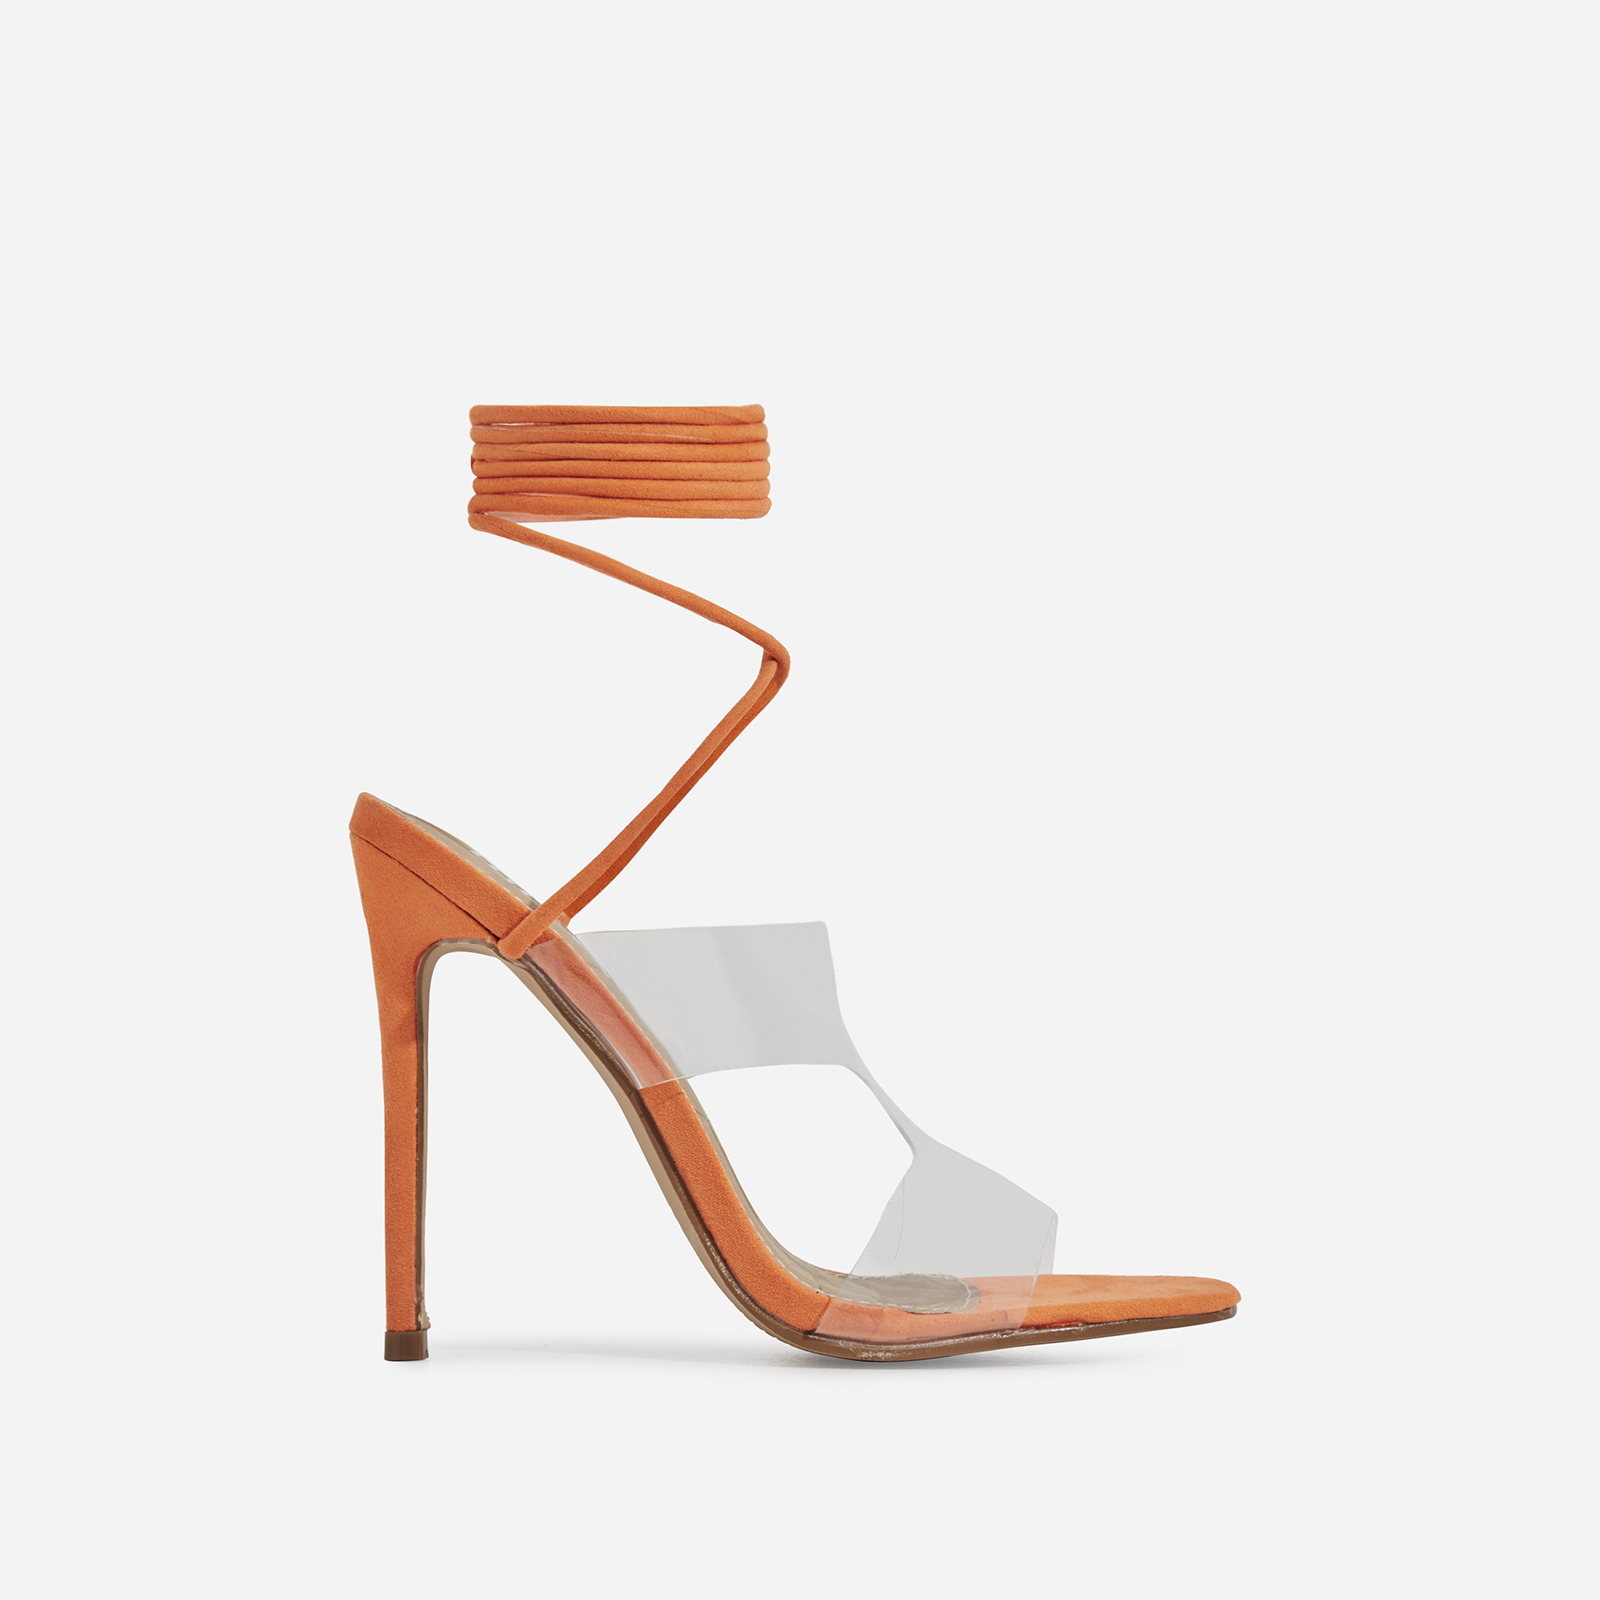 Vivica Lace Up Perspex Heel In Orange Faux Suede